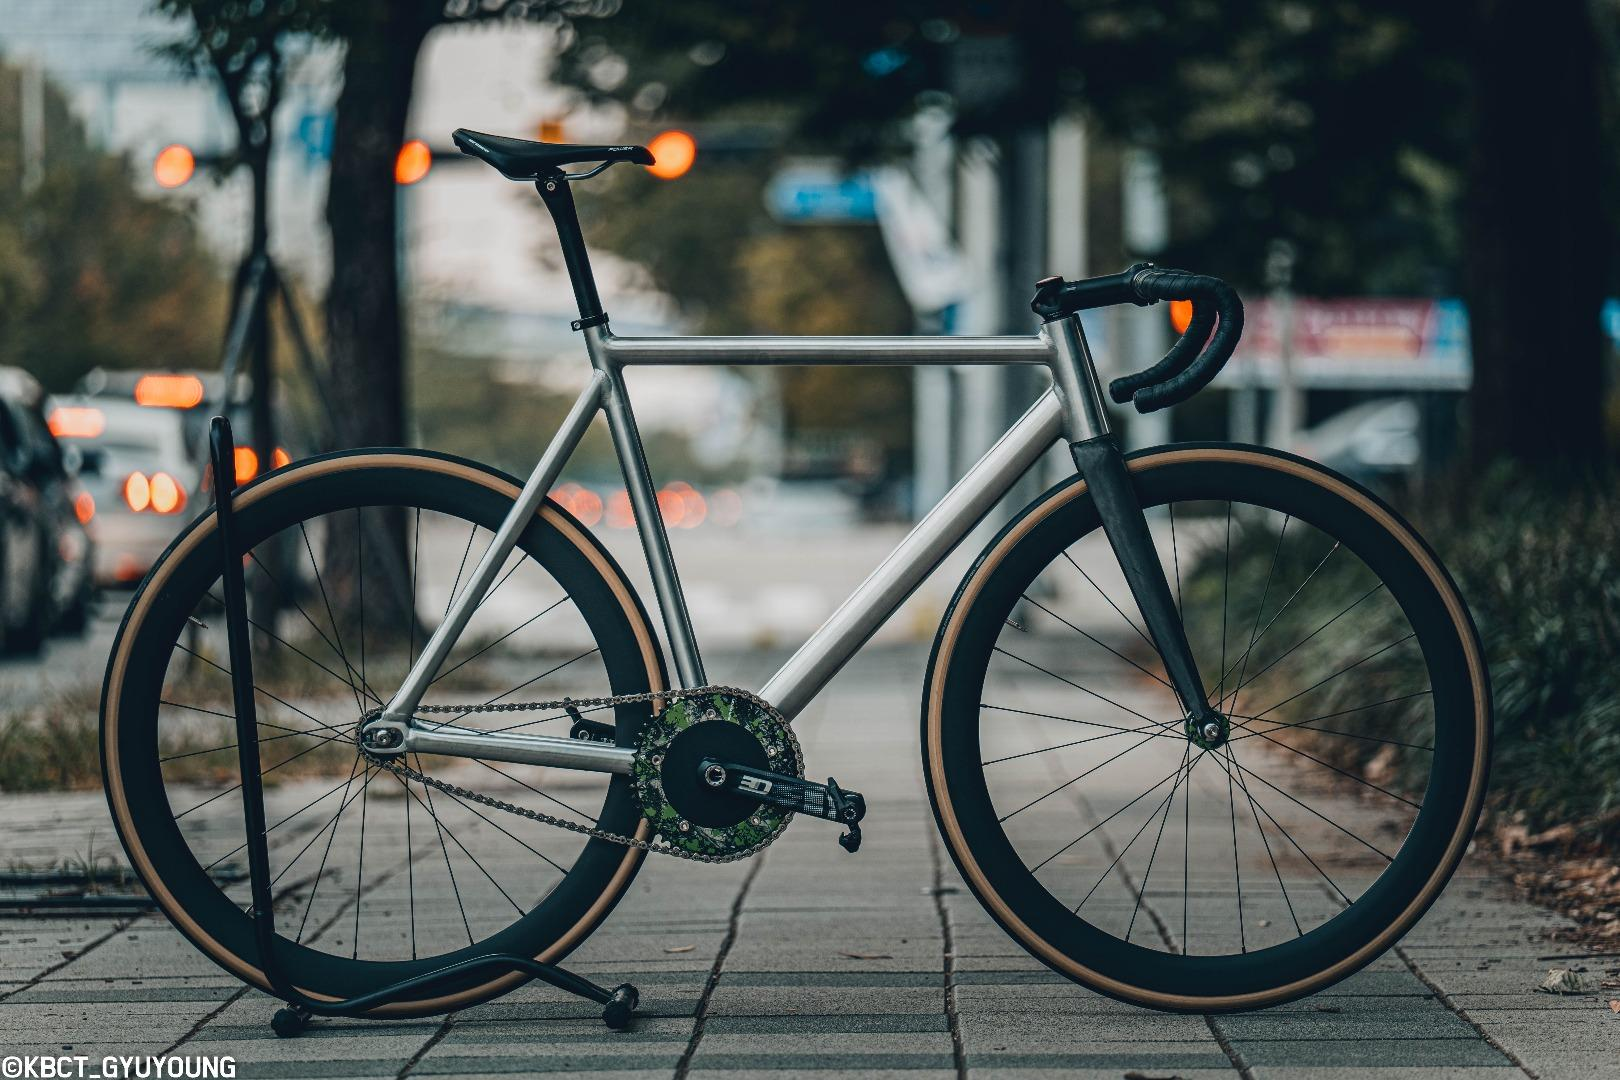 constantine-disparar-crit-bike-with-46mm-carbon-rimmed-wheels